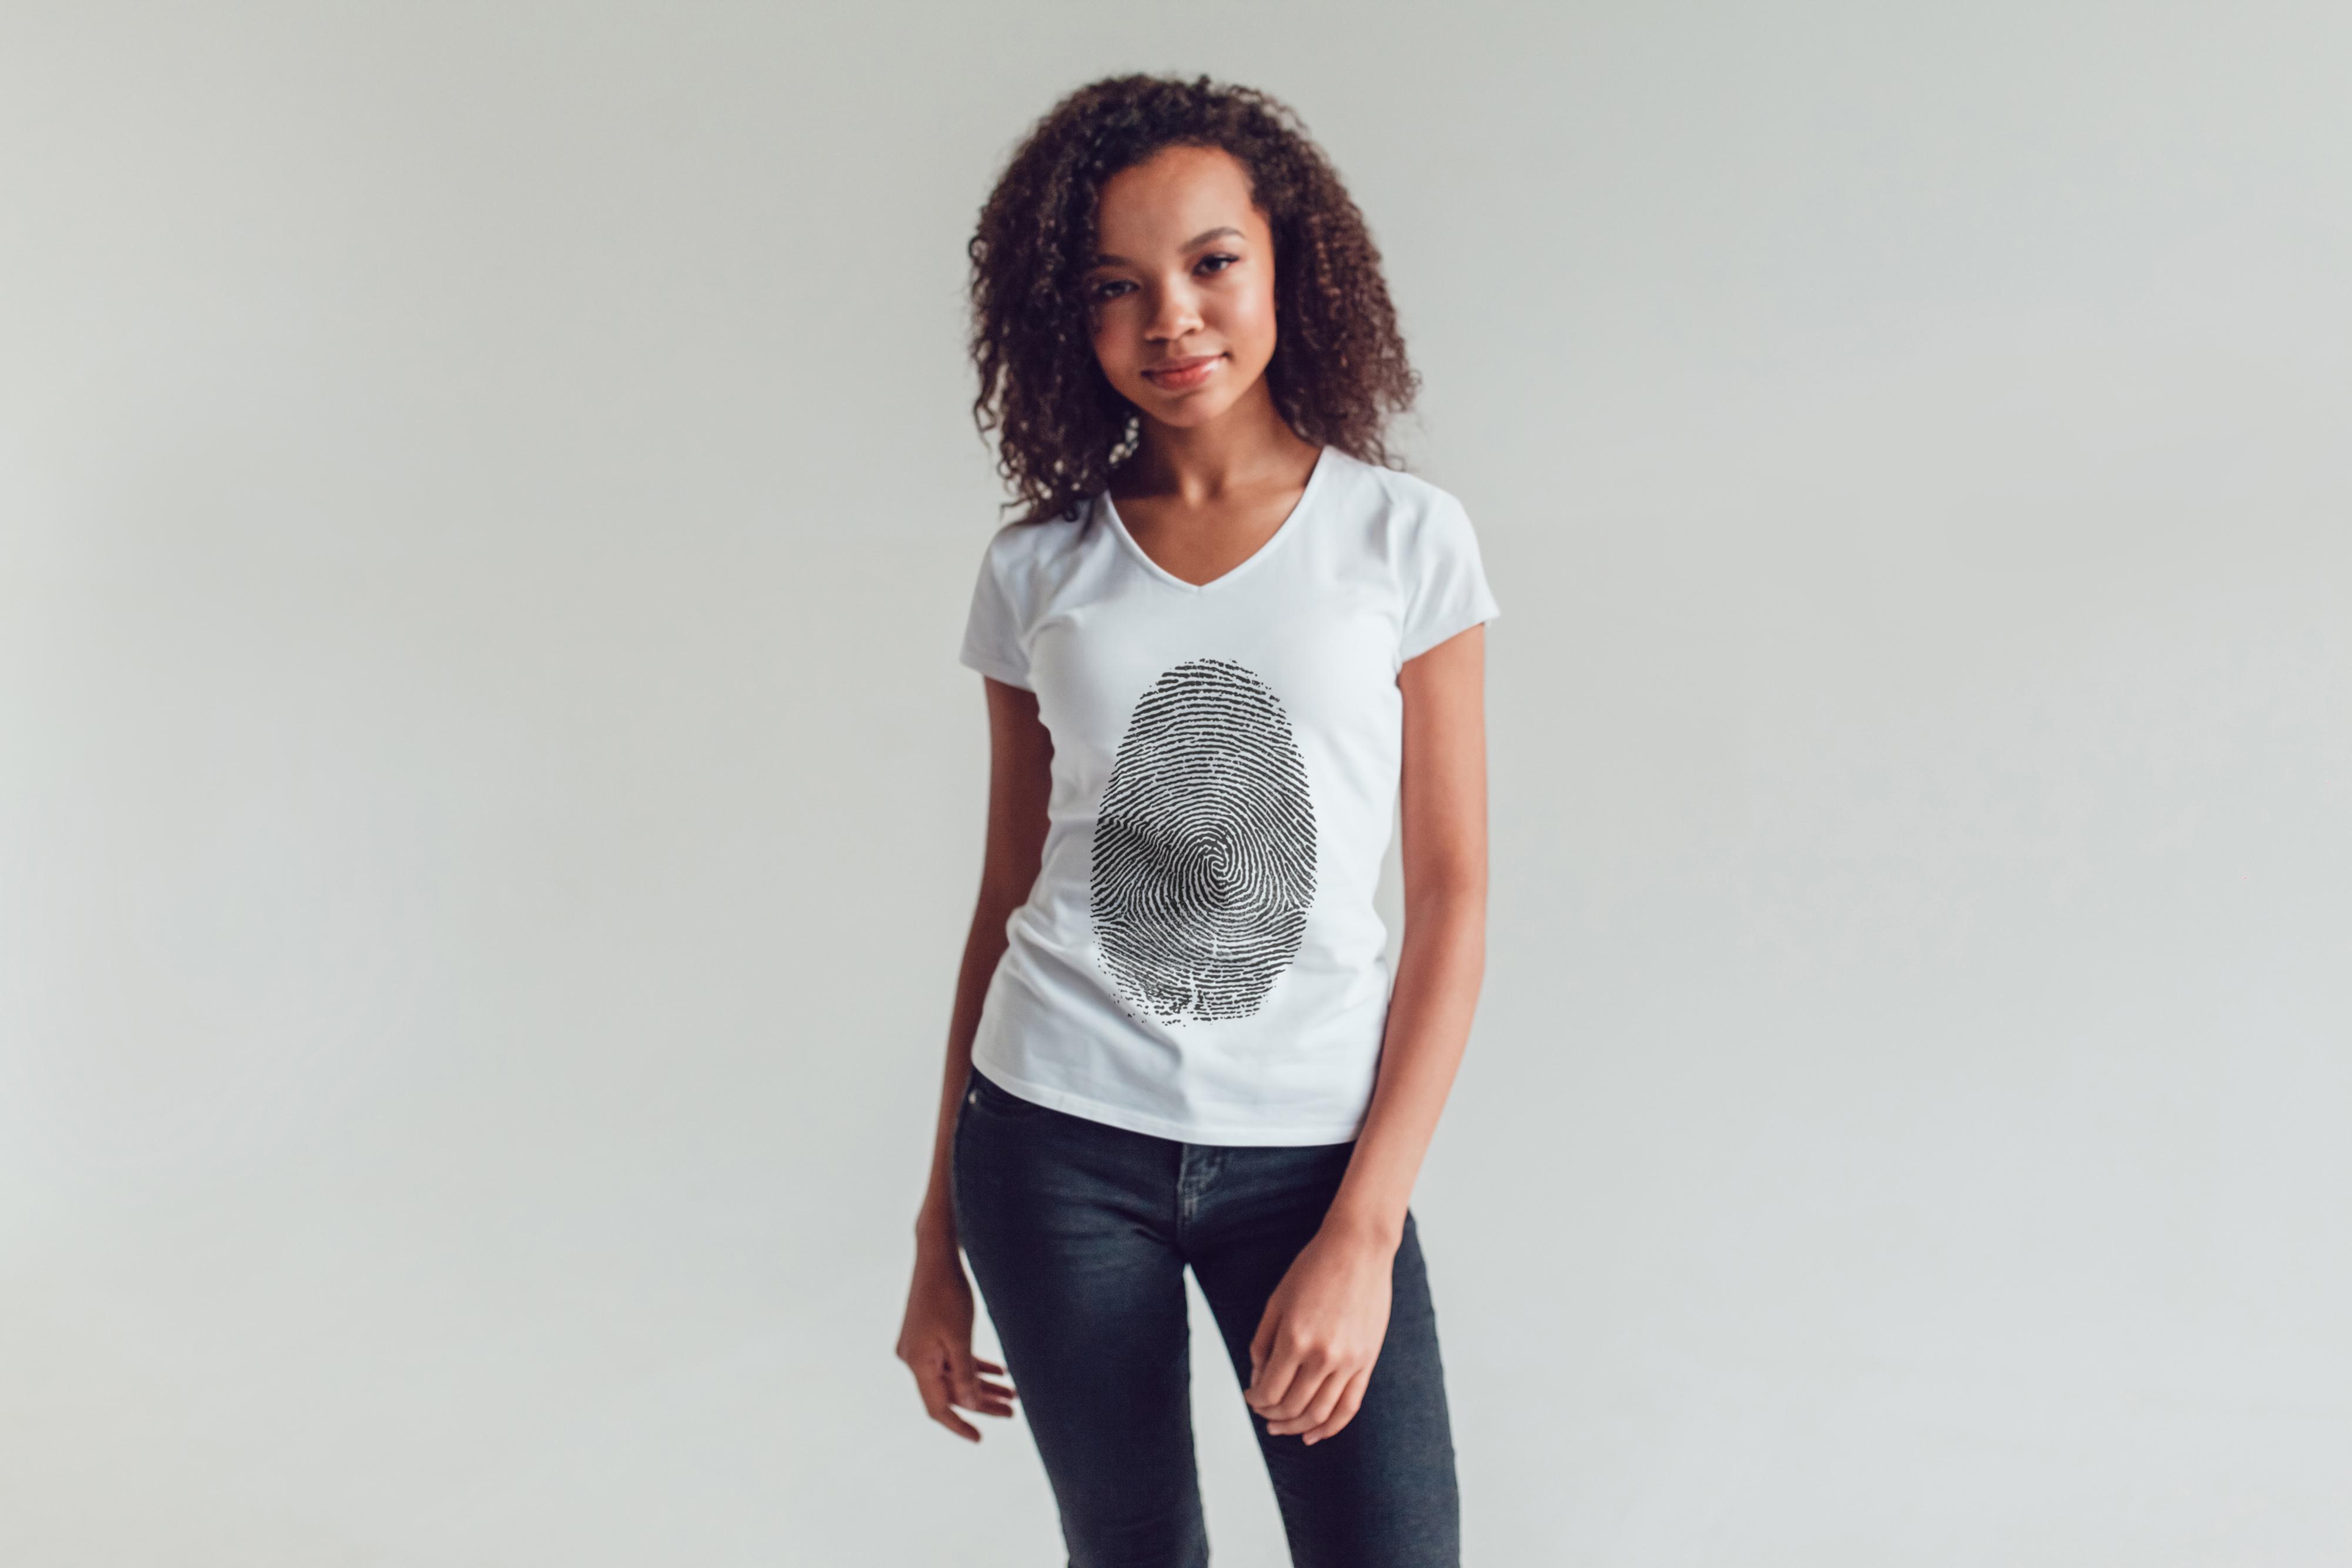 T-Shirt Mock-Up Vol.20 2017 example image 9